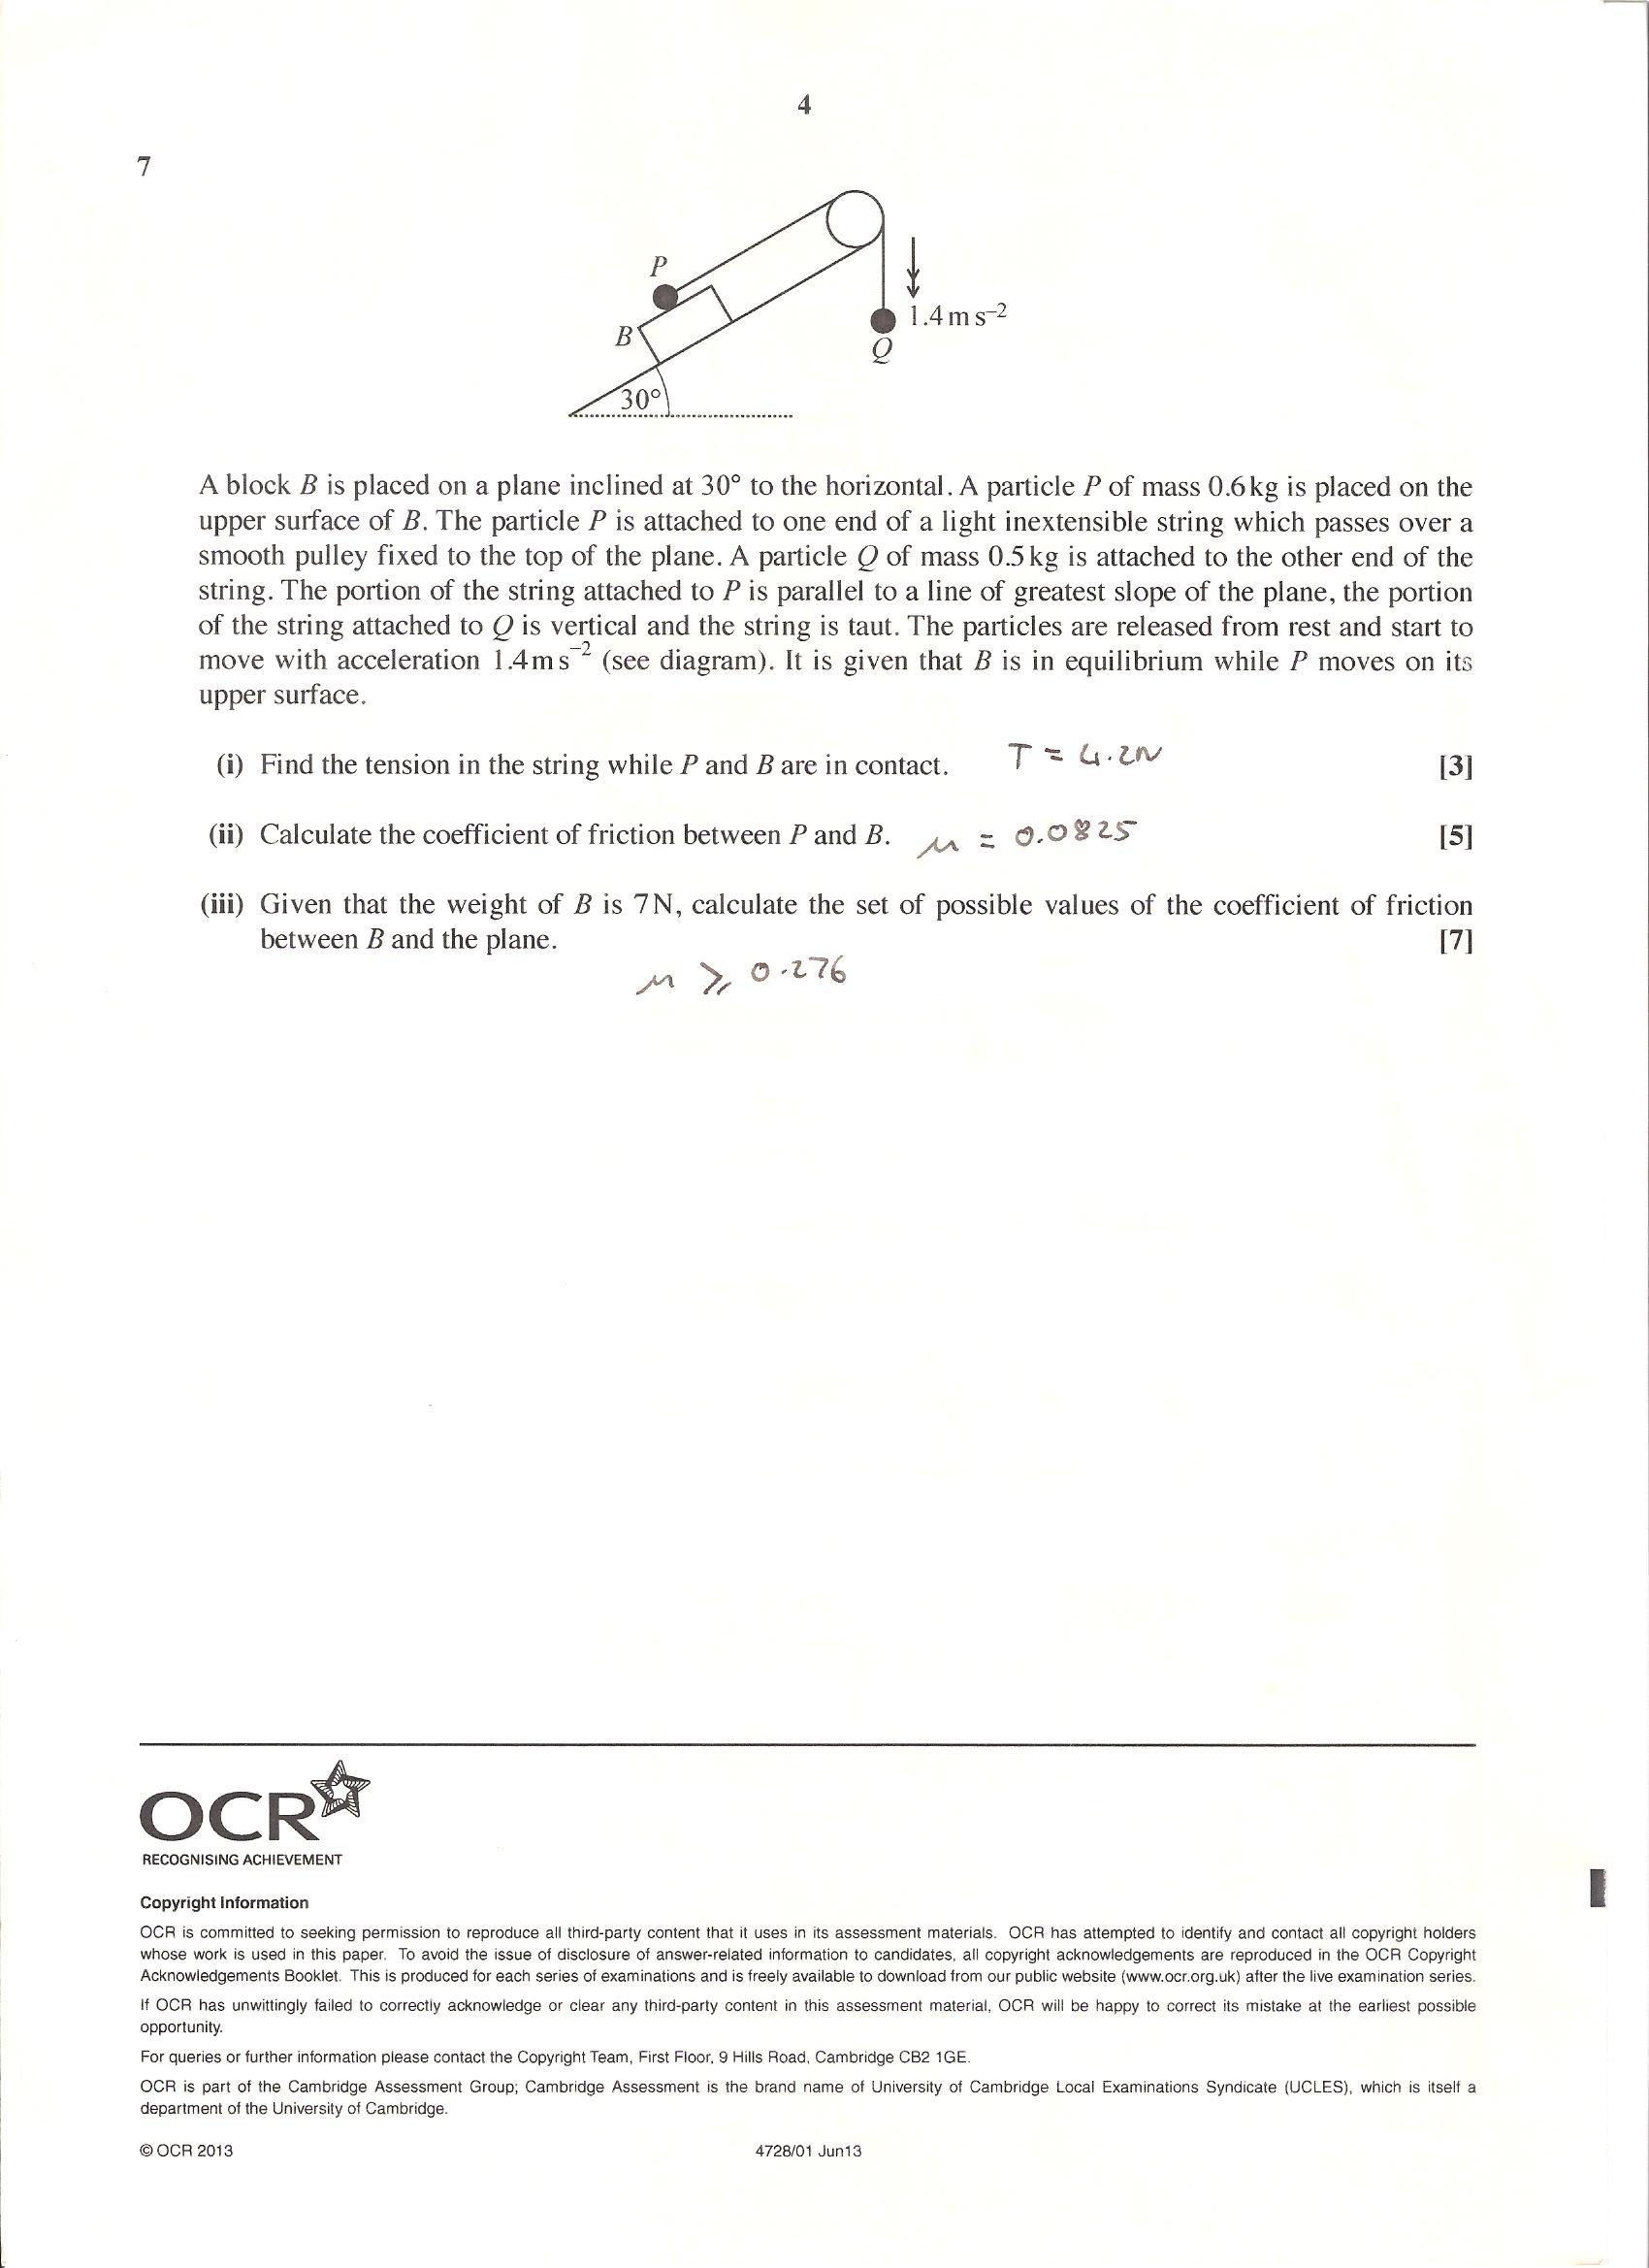 Ocr terminal paper grade boundaries